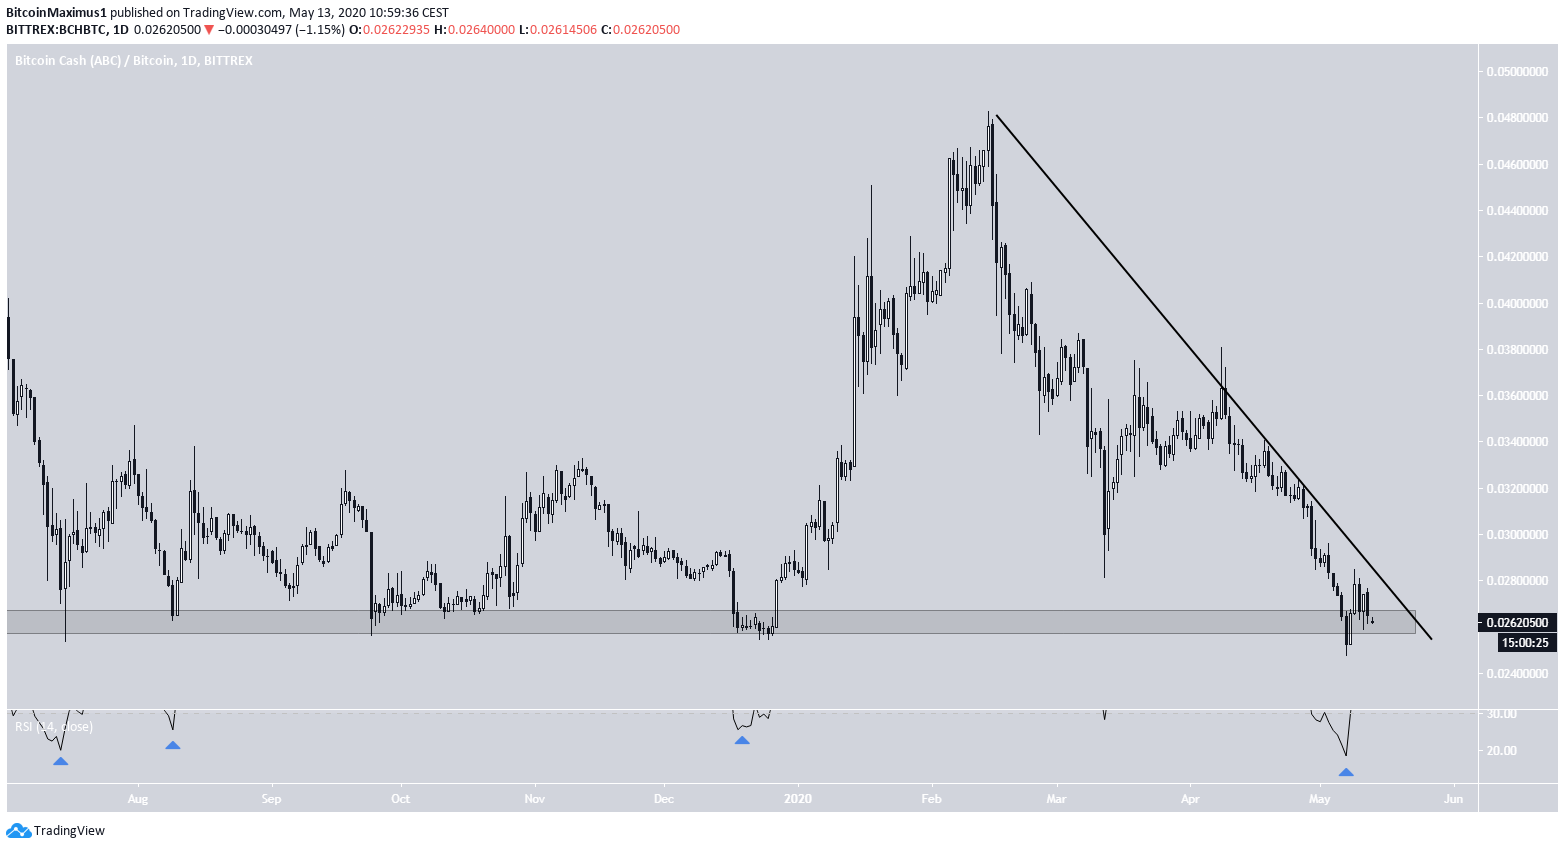 BCH Price Movement